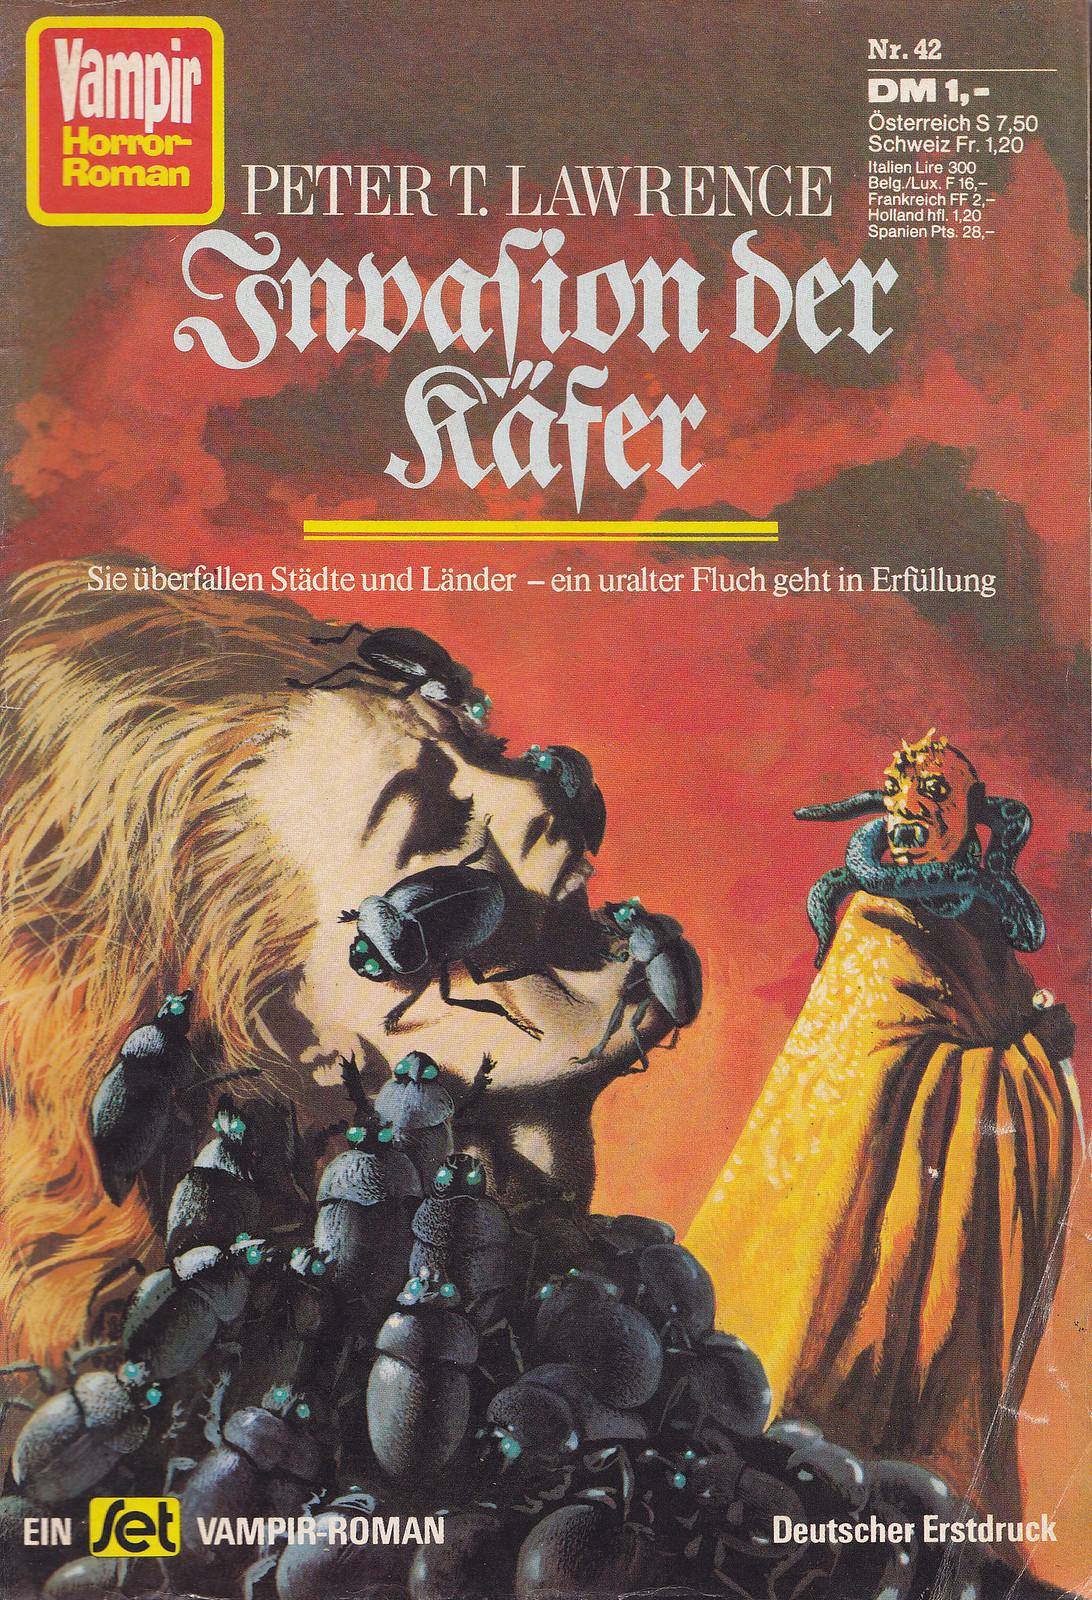 Karel Thole - Vampir Horror Roman - 042